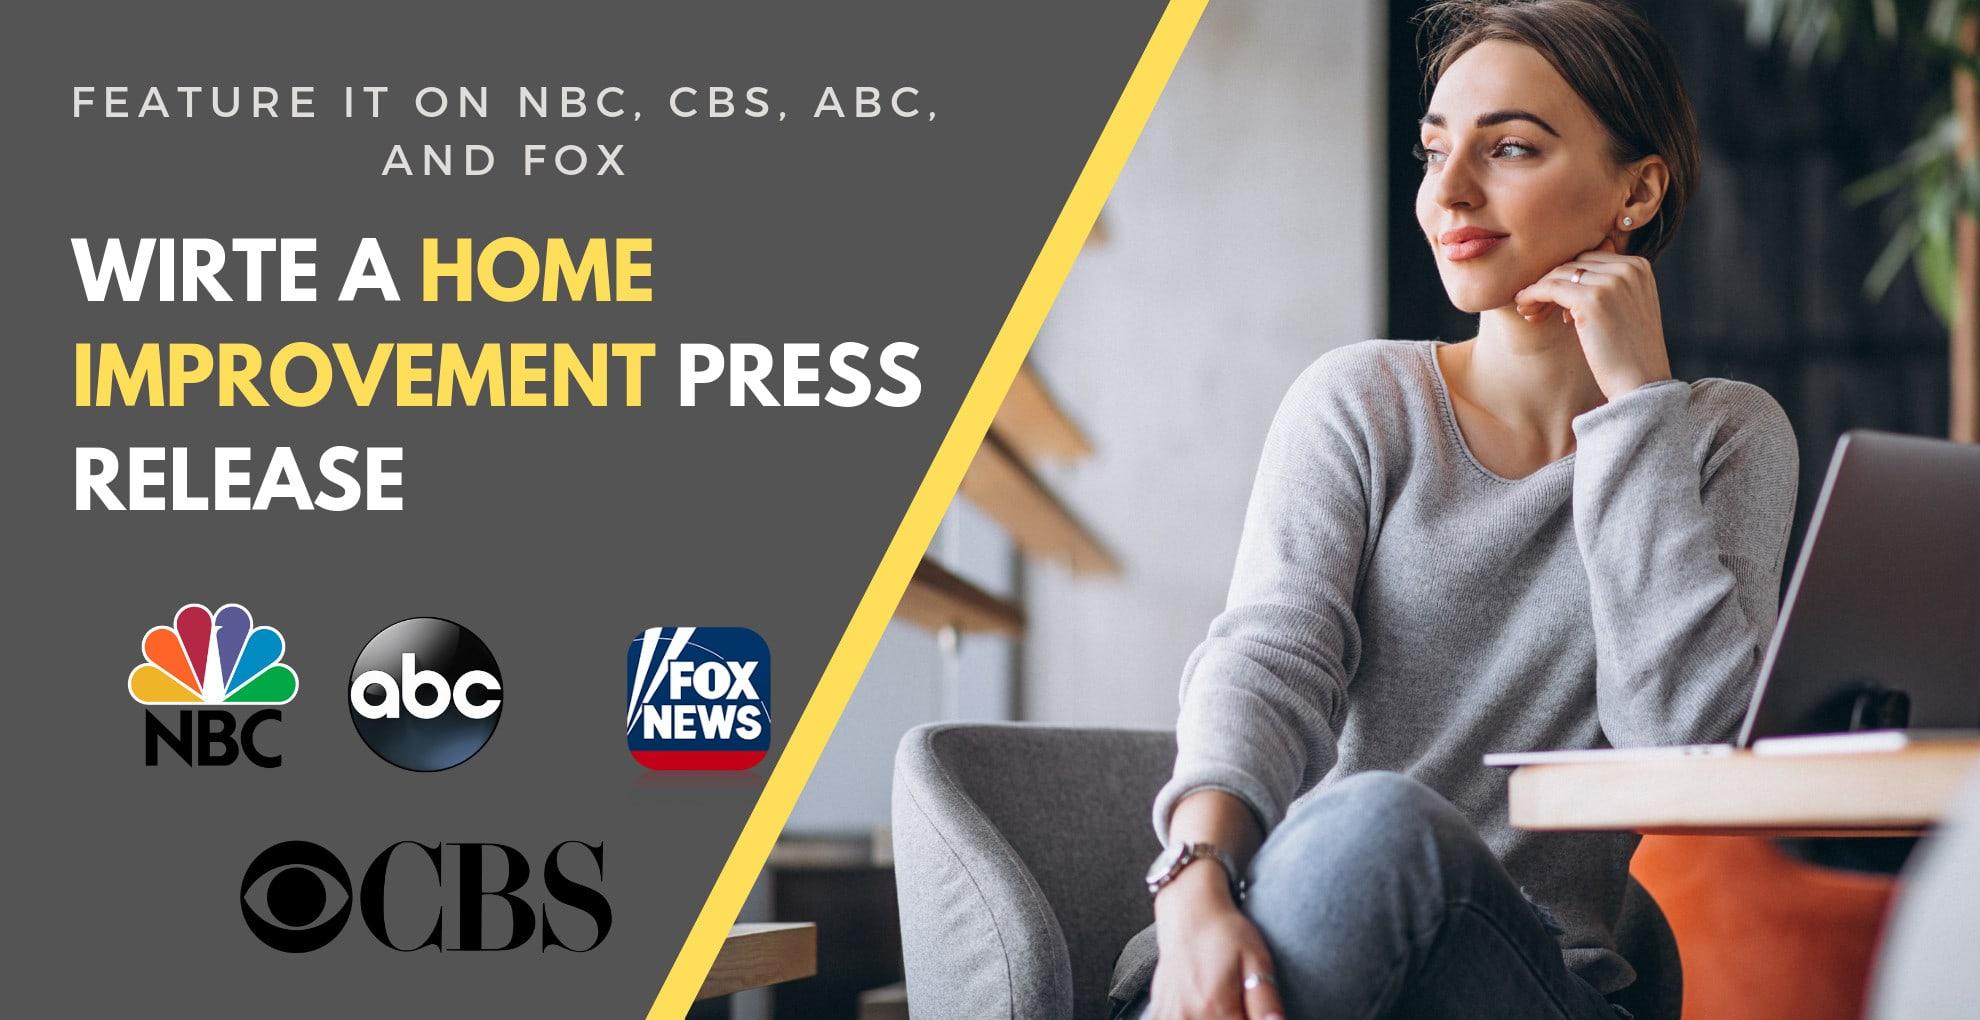 I will write home improvement press release and do distribution on FOX CBS NBC ETC